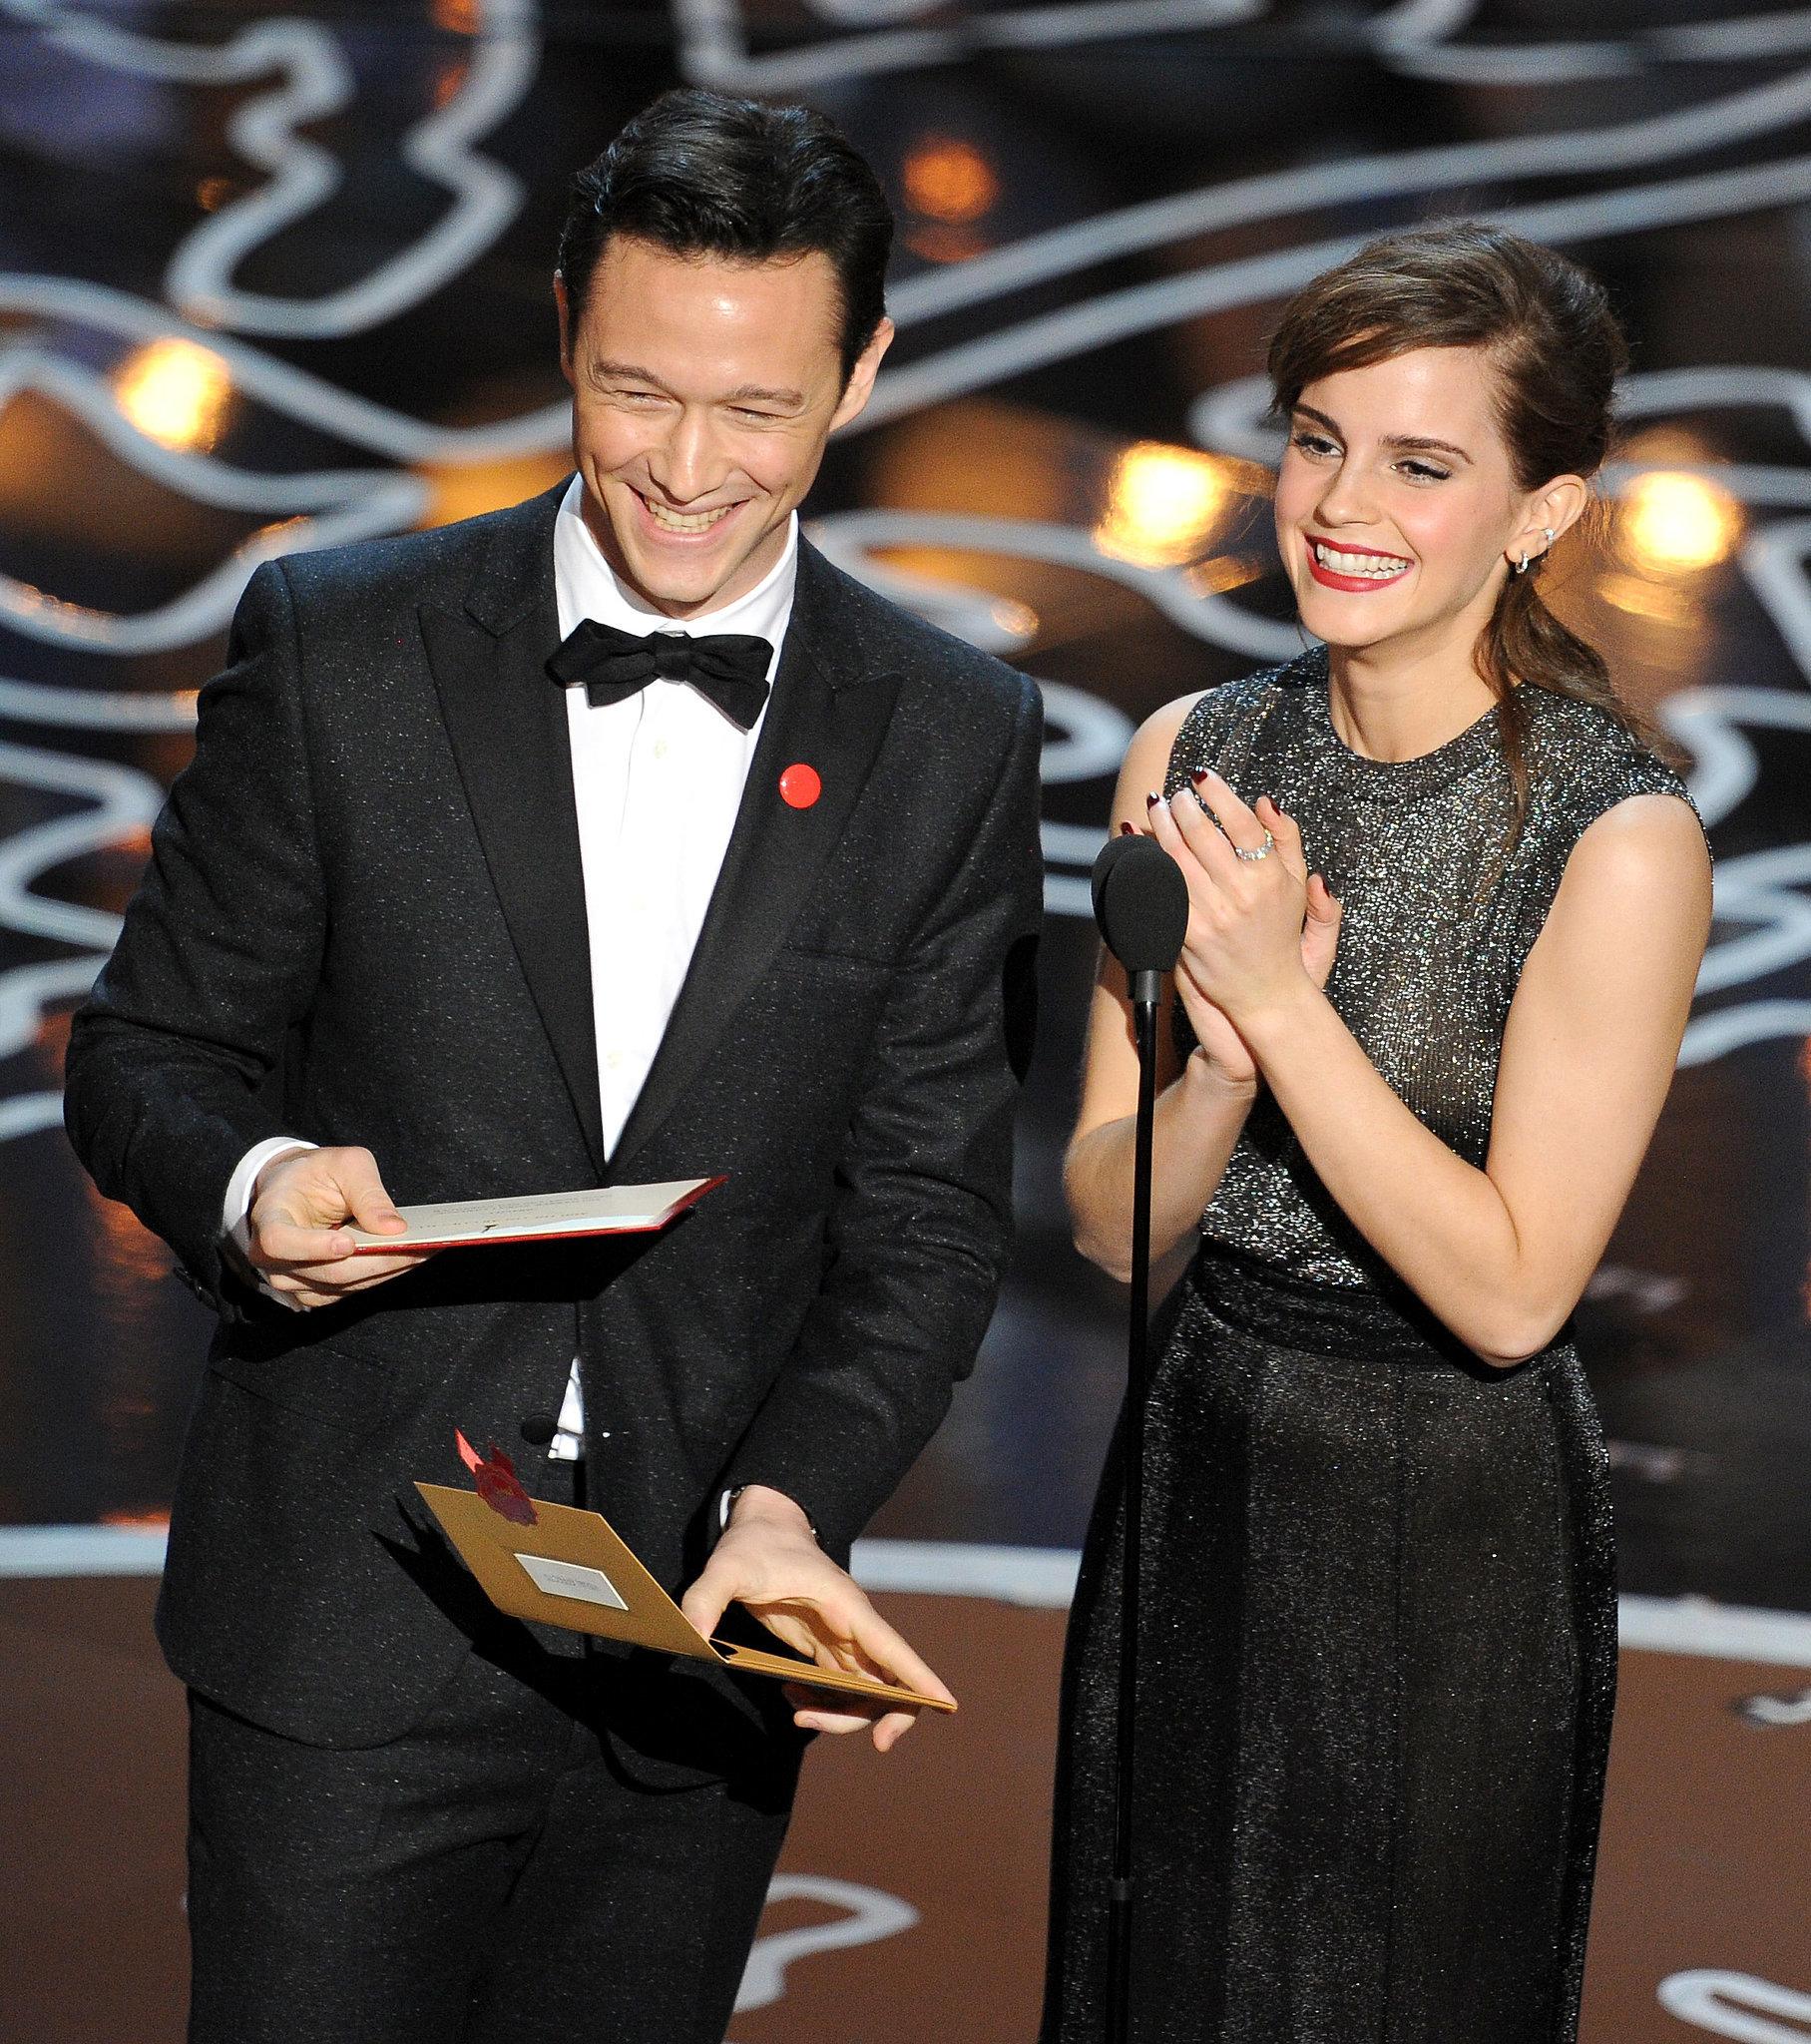 Joseph Gordon-Levitt and Emma Watson laughed.